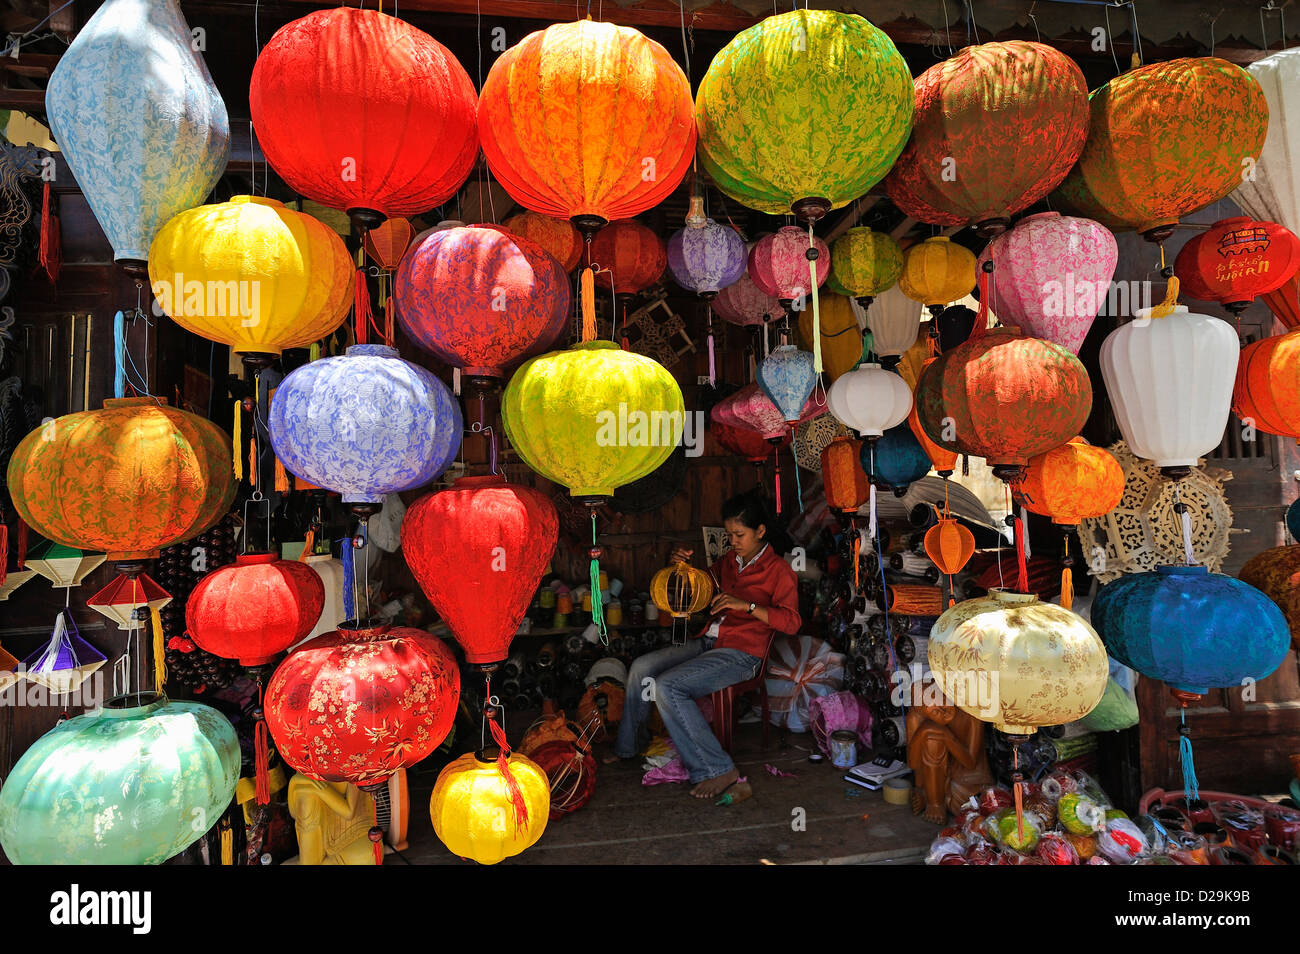 Lanterne appese in negozio, Hoi An, Vietnam Immagini Stock